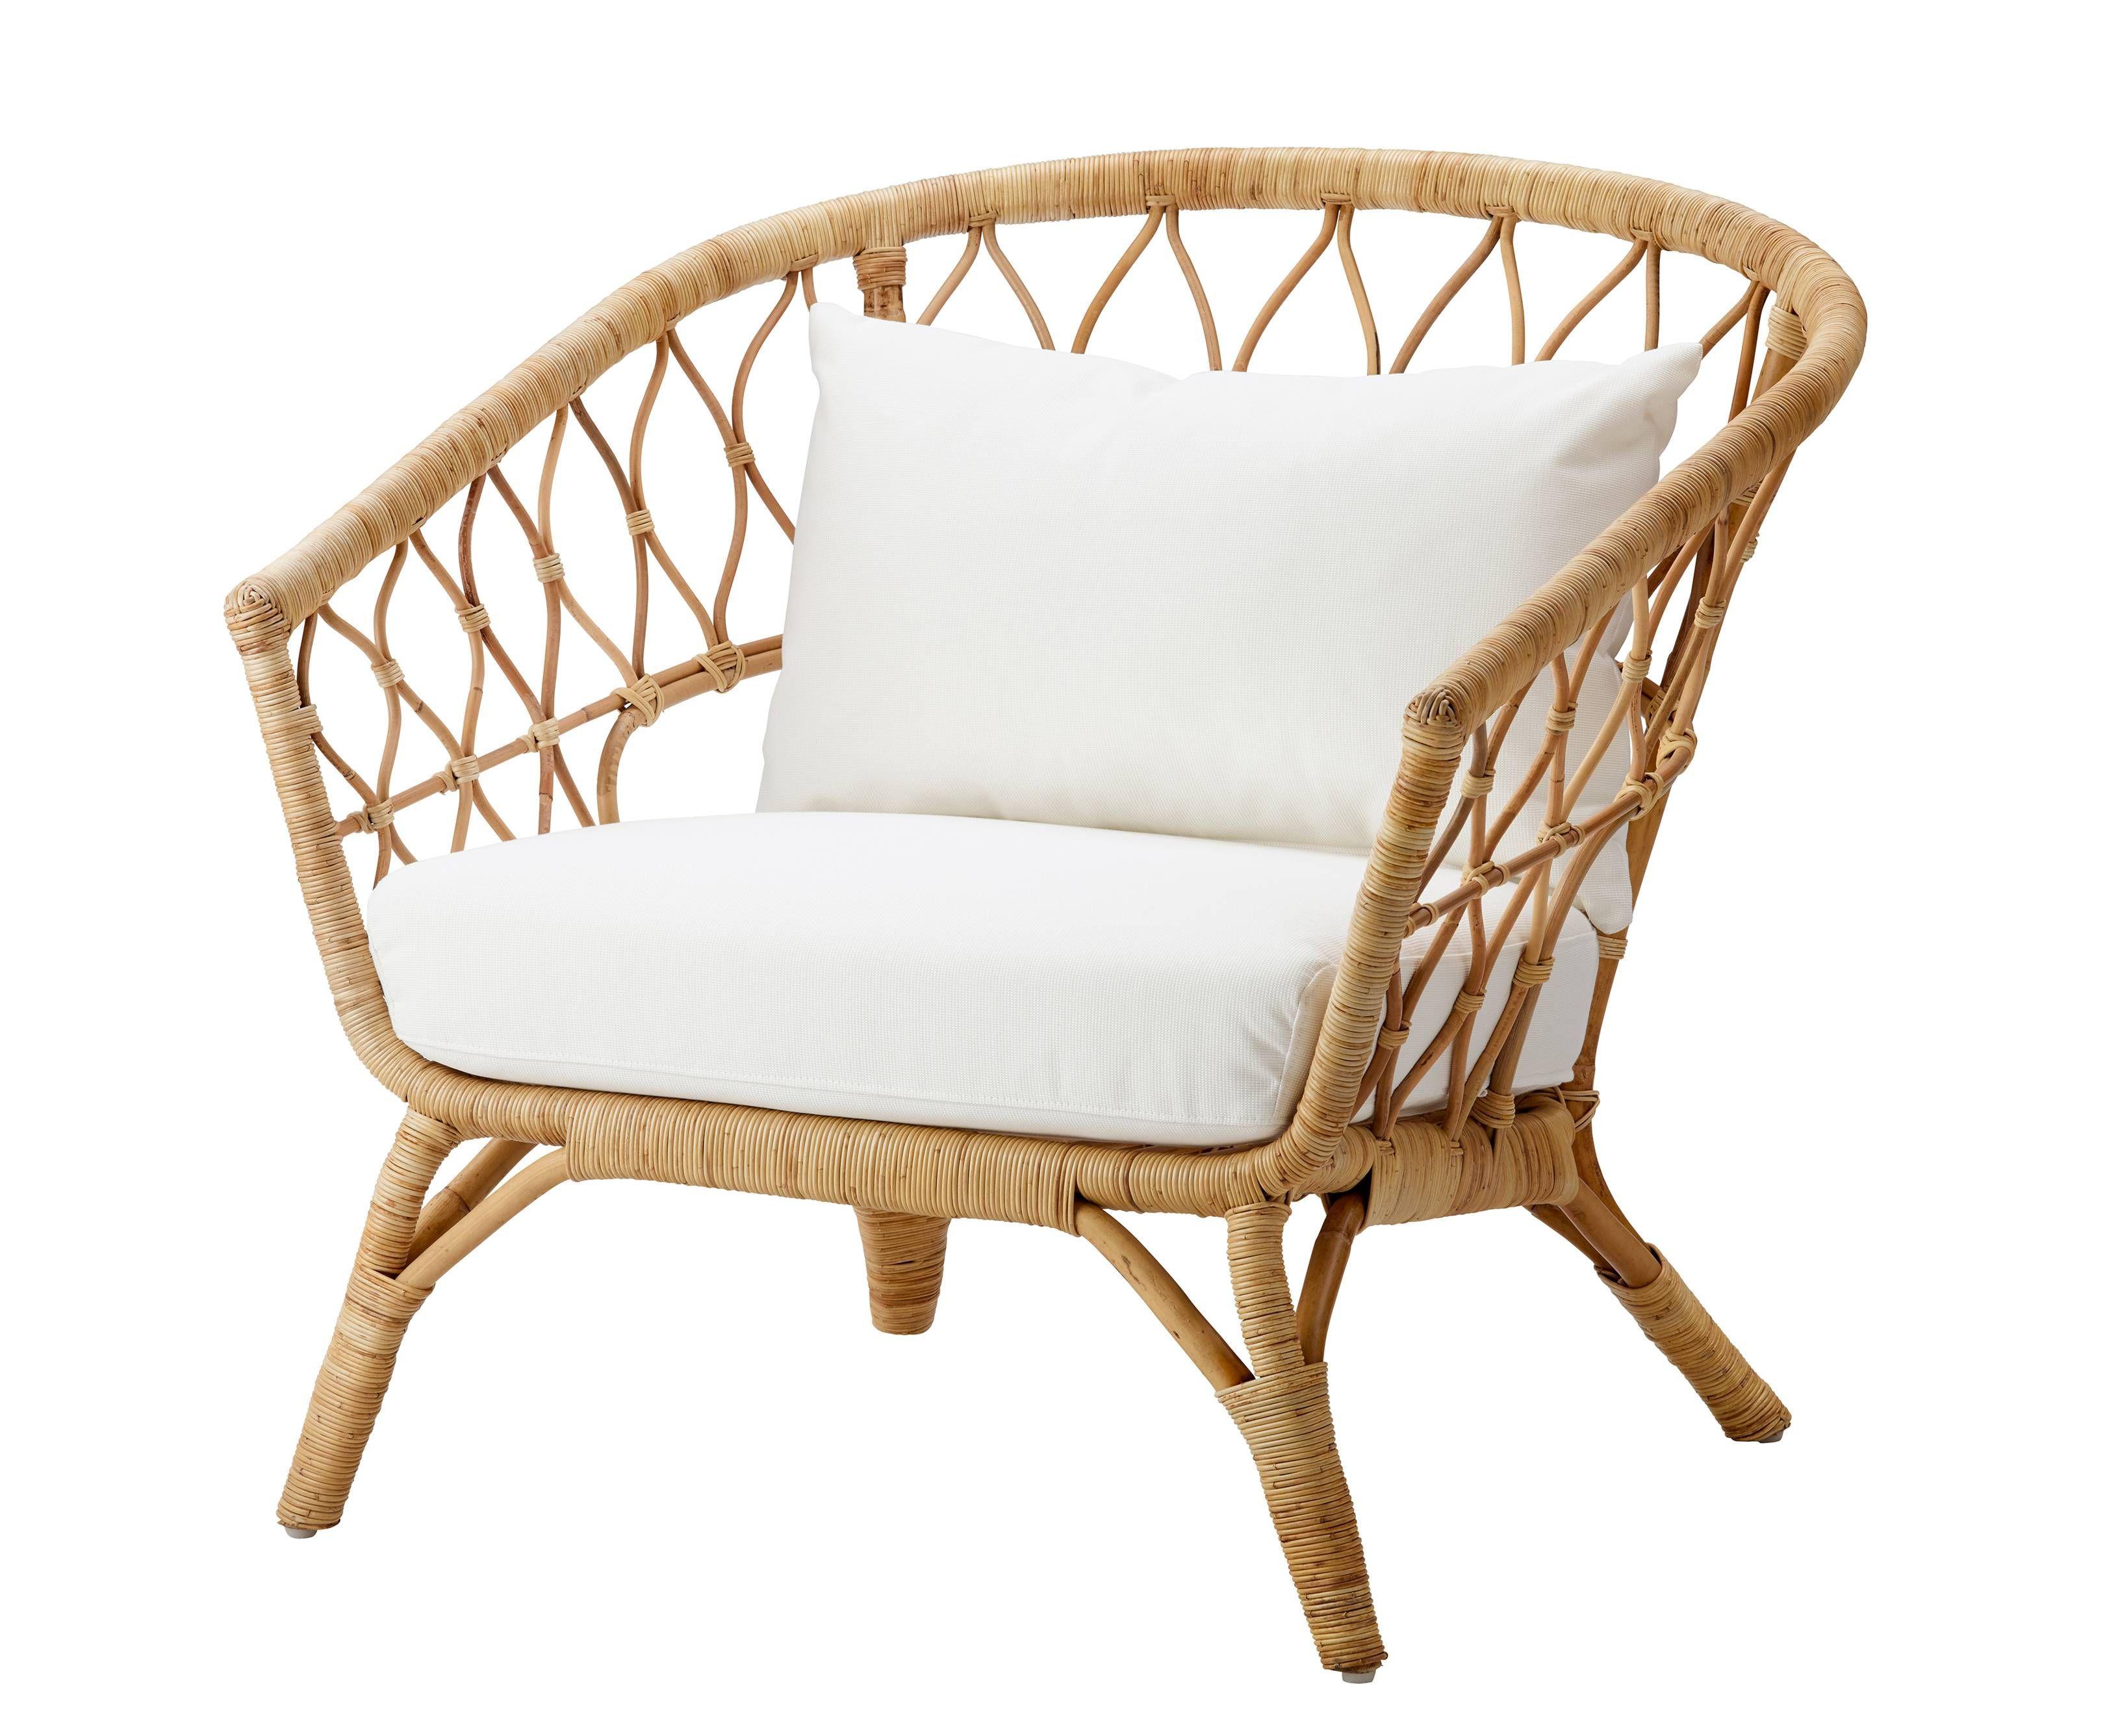 Ikea Rattan Chair